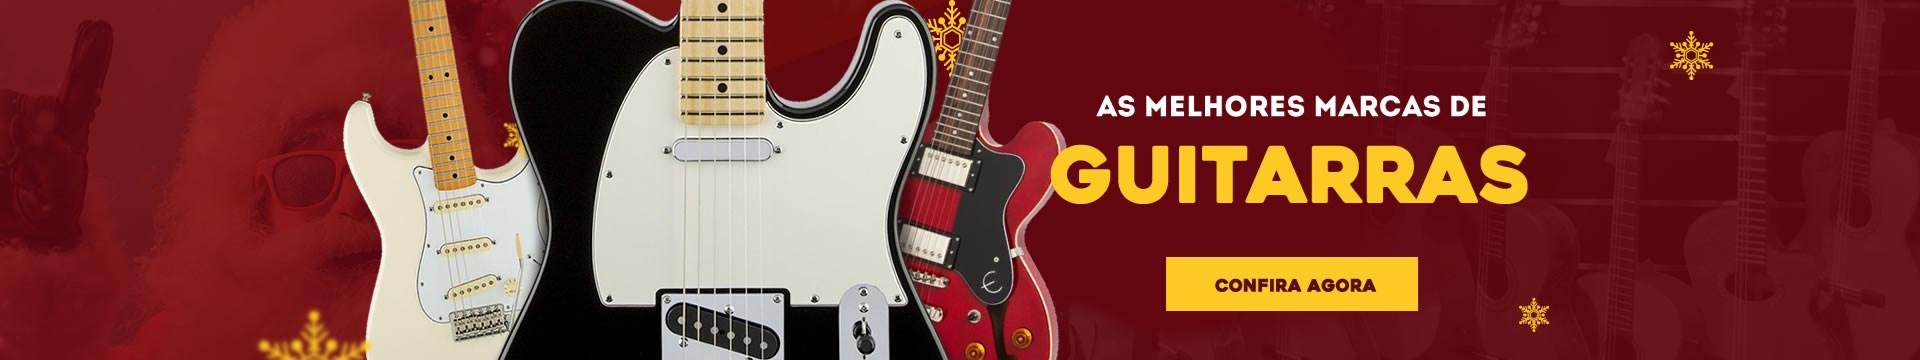 Natal 2018 - Guitarras